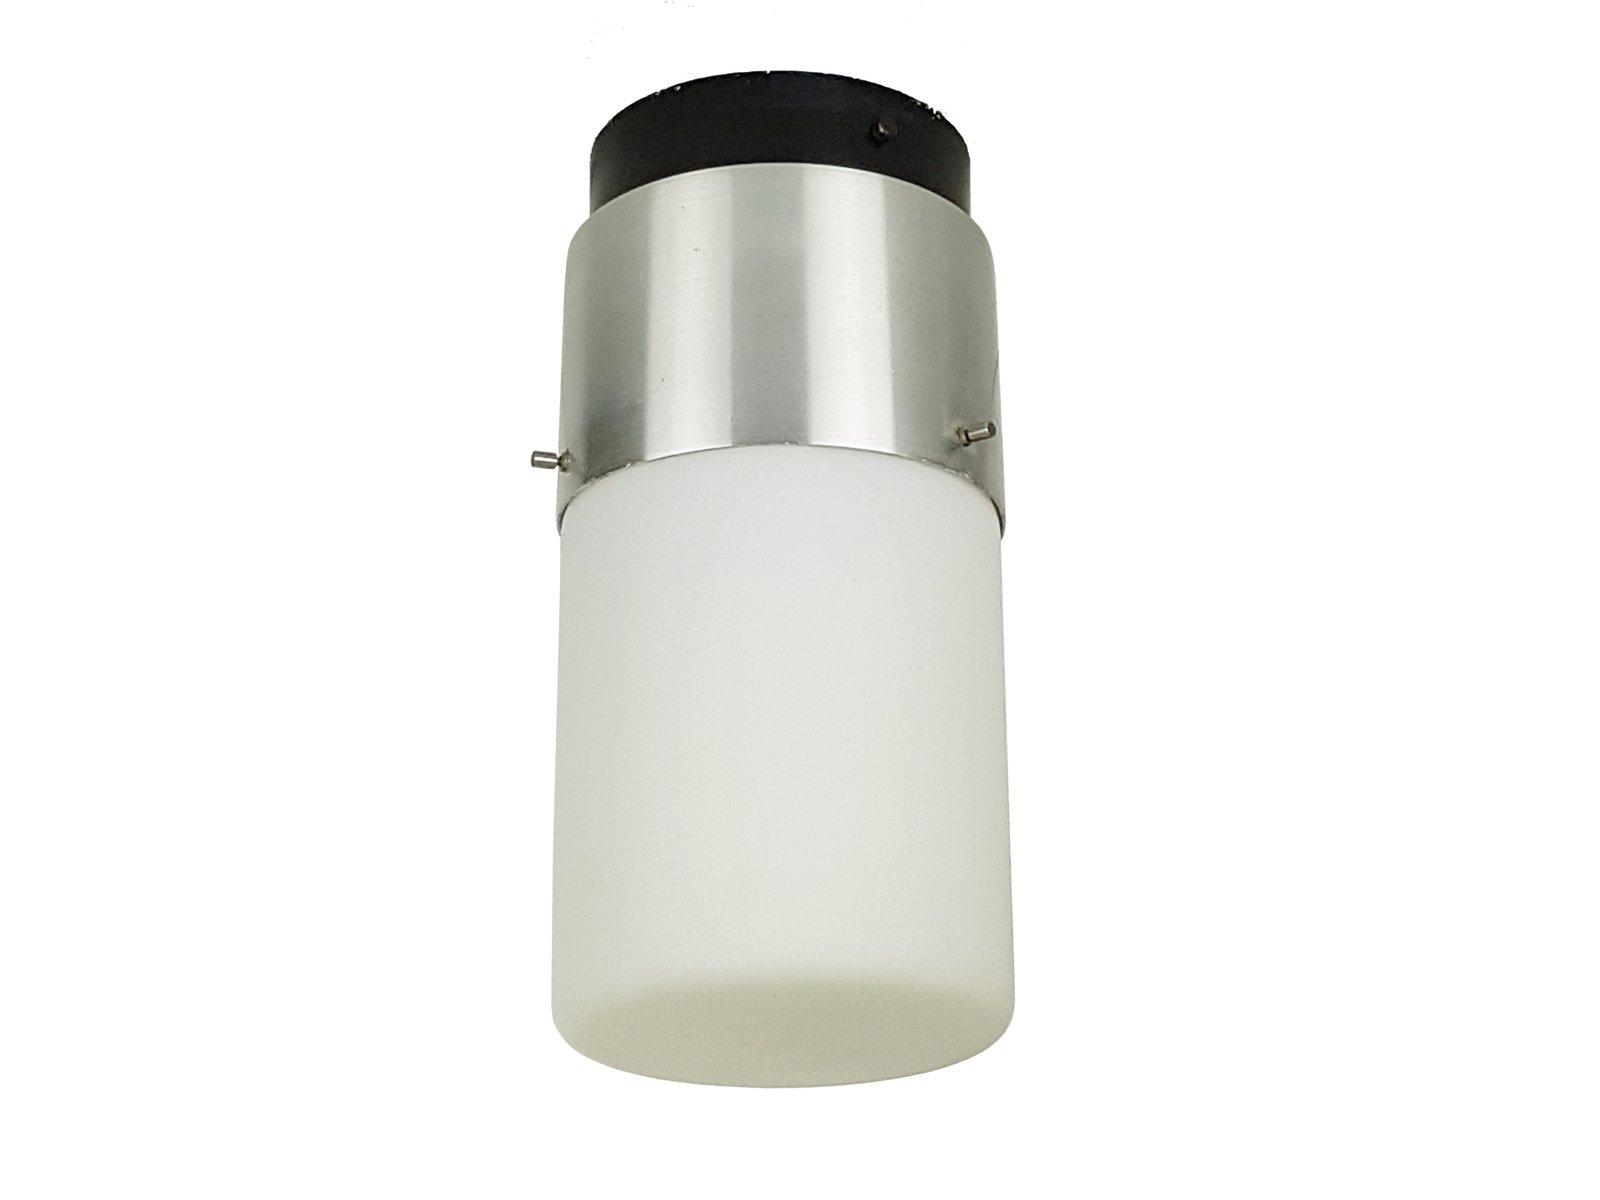 Zylinderförmiger Deckenfluter aus Opalglas, Aluminium & schwarzem Meta...